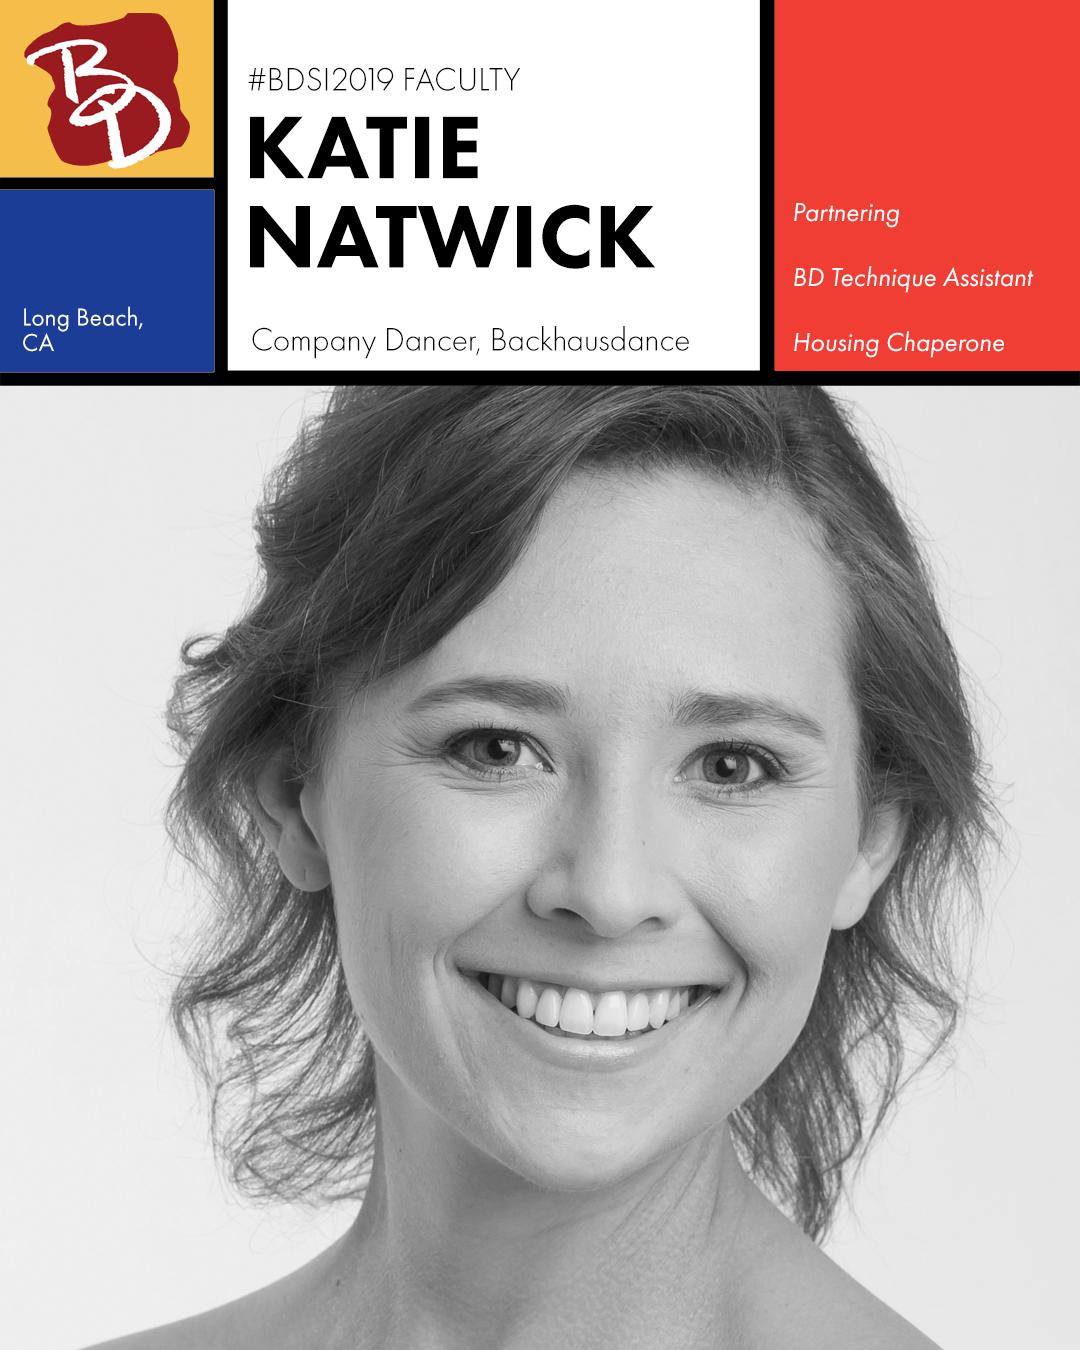 Faculty Announcement - Natwick Katie.jpg